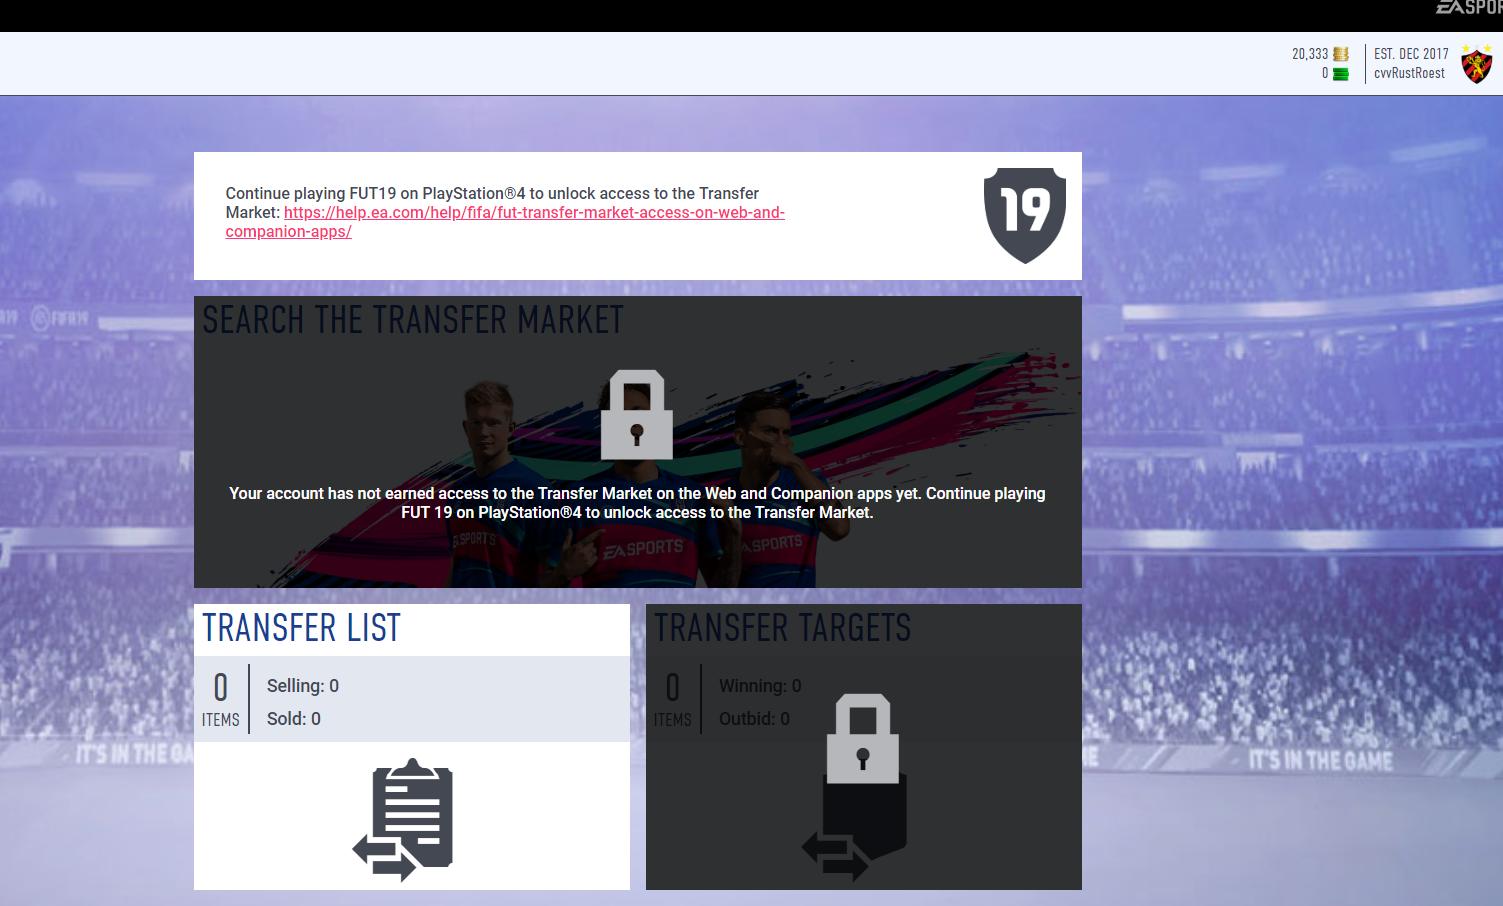 The transfer market is locked on the fifa 19 companion app